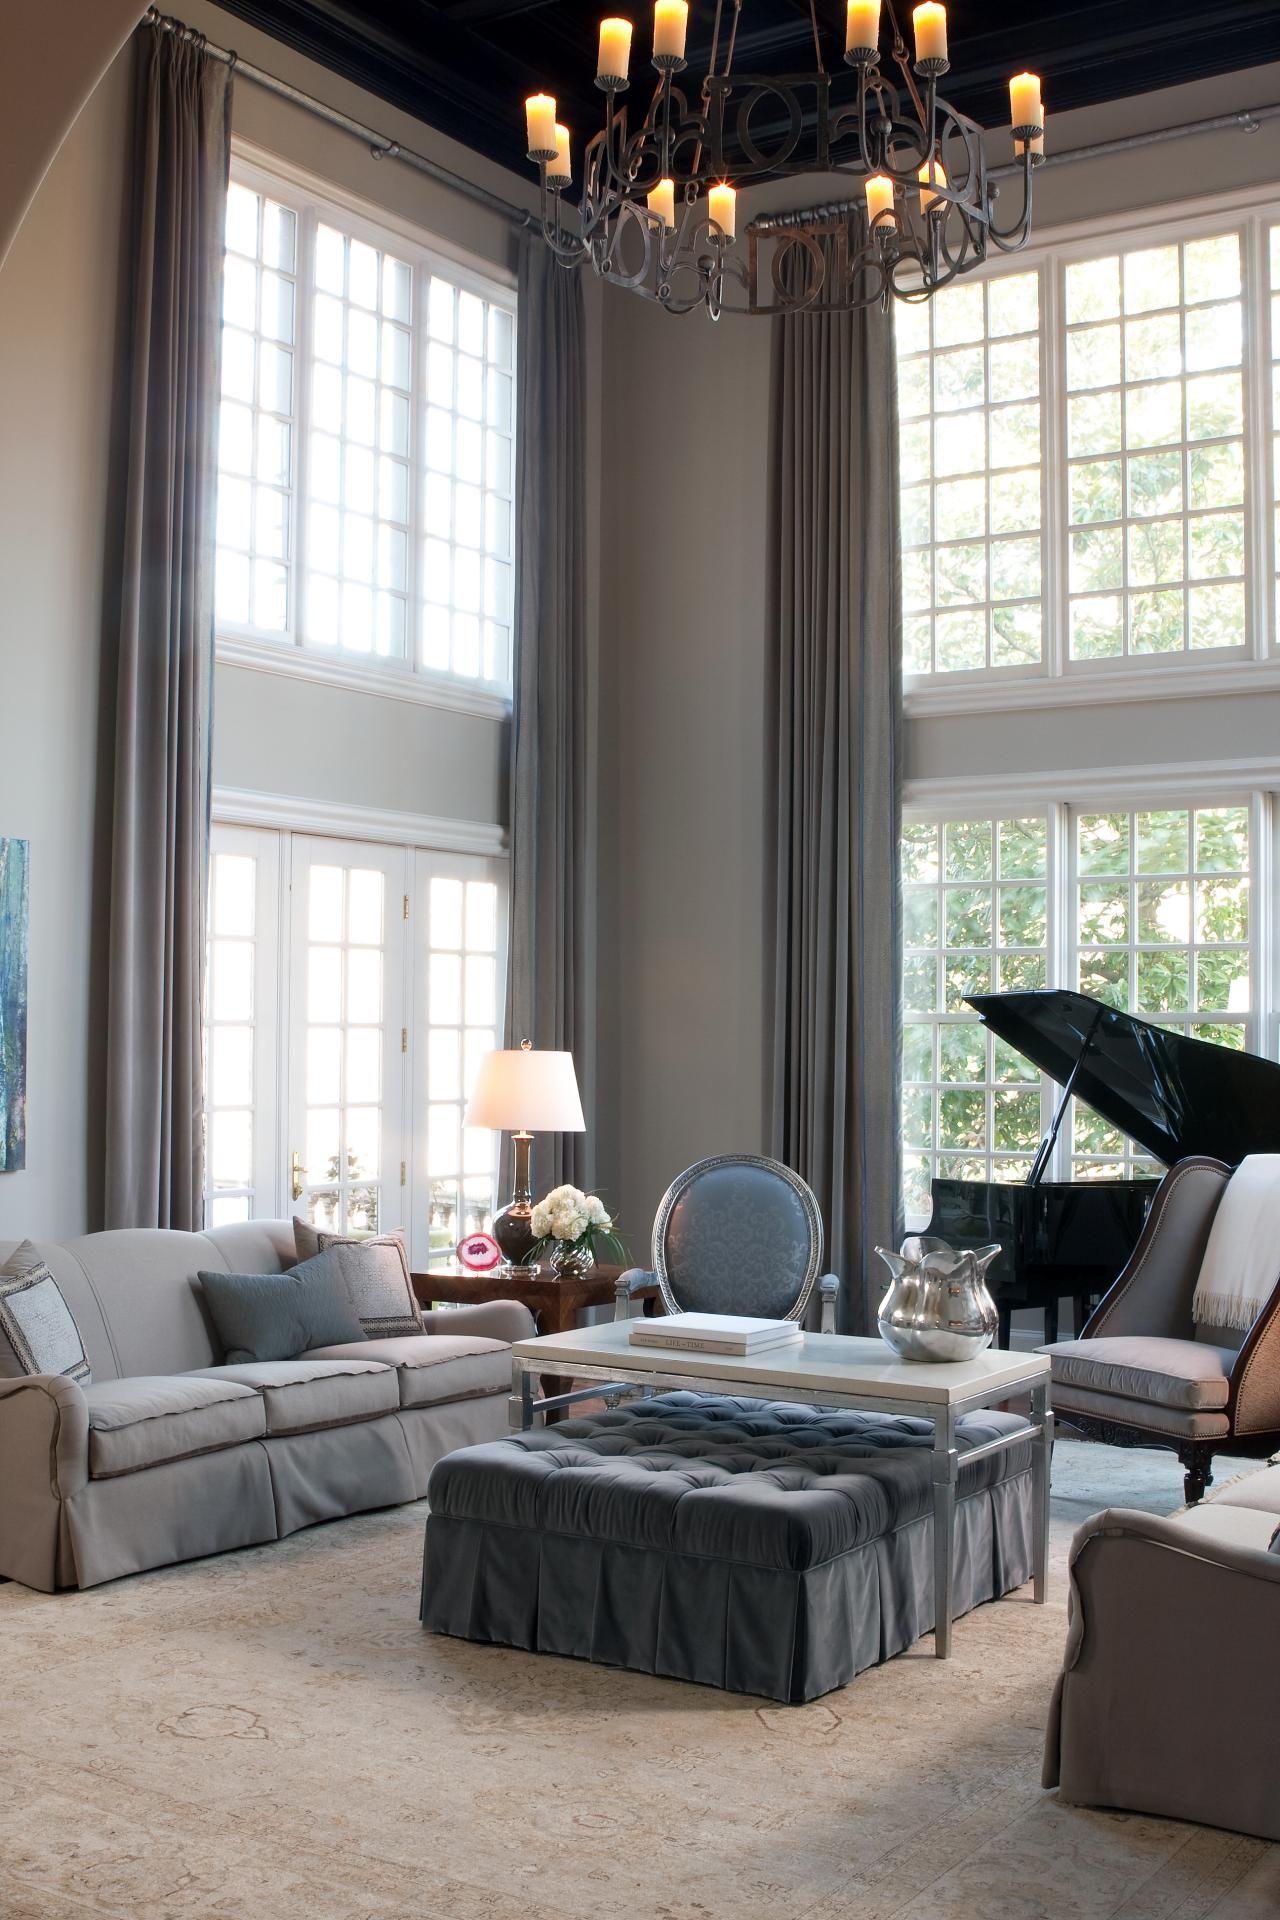 High Ceiling Living Room Curtain Ideas High Ceiling Living Room